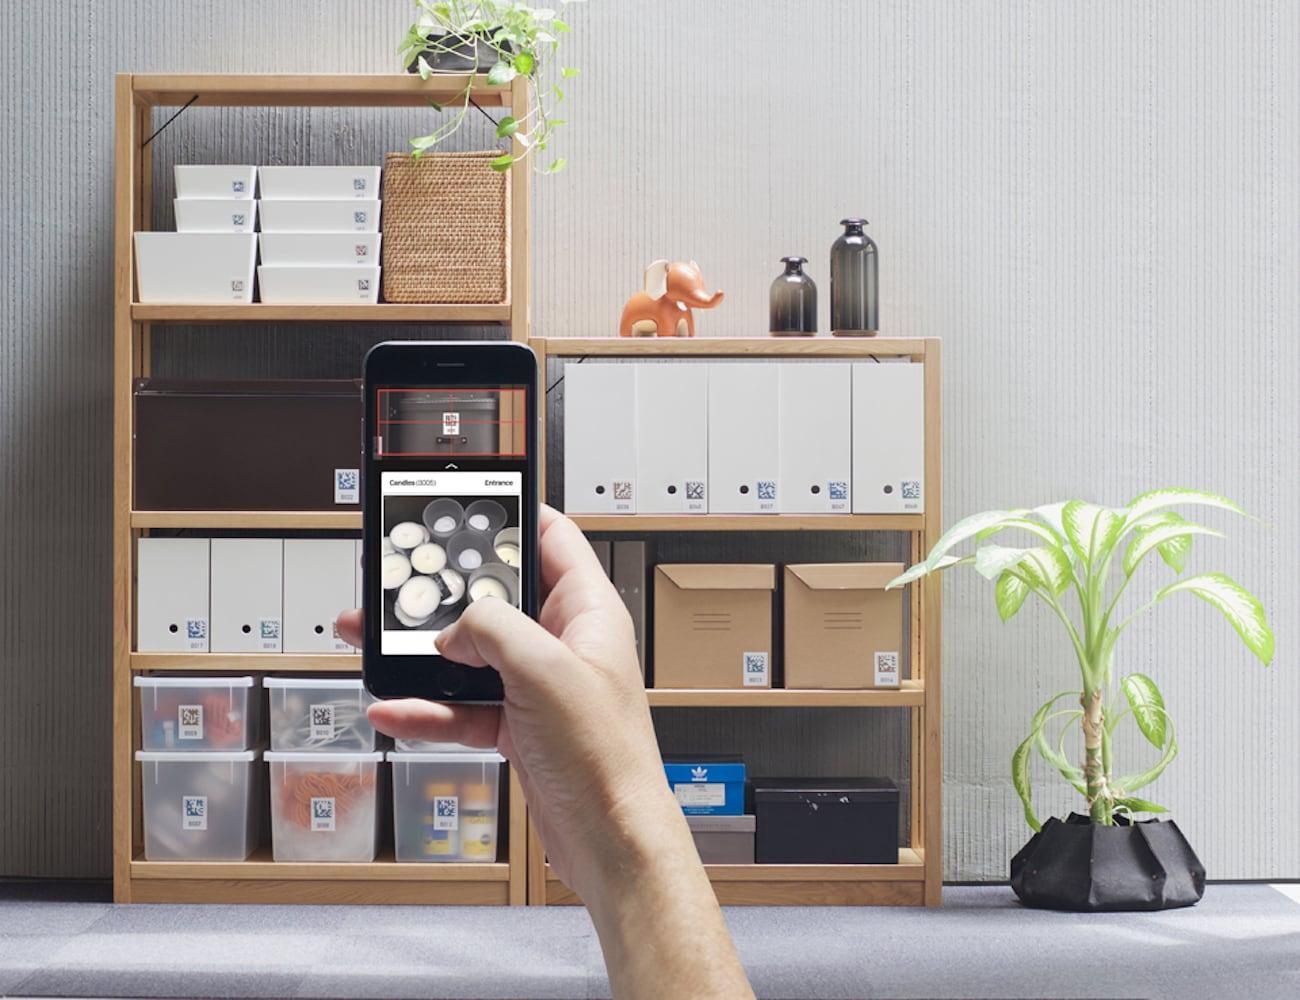 Quick Peek Smart Storage Labels